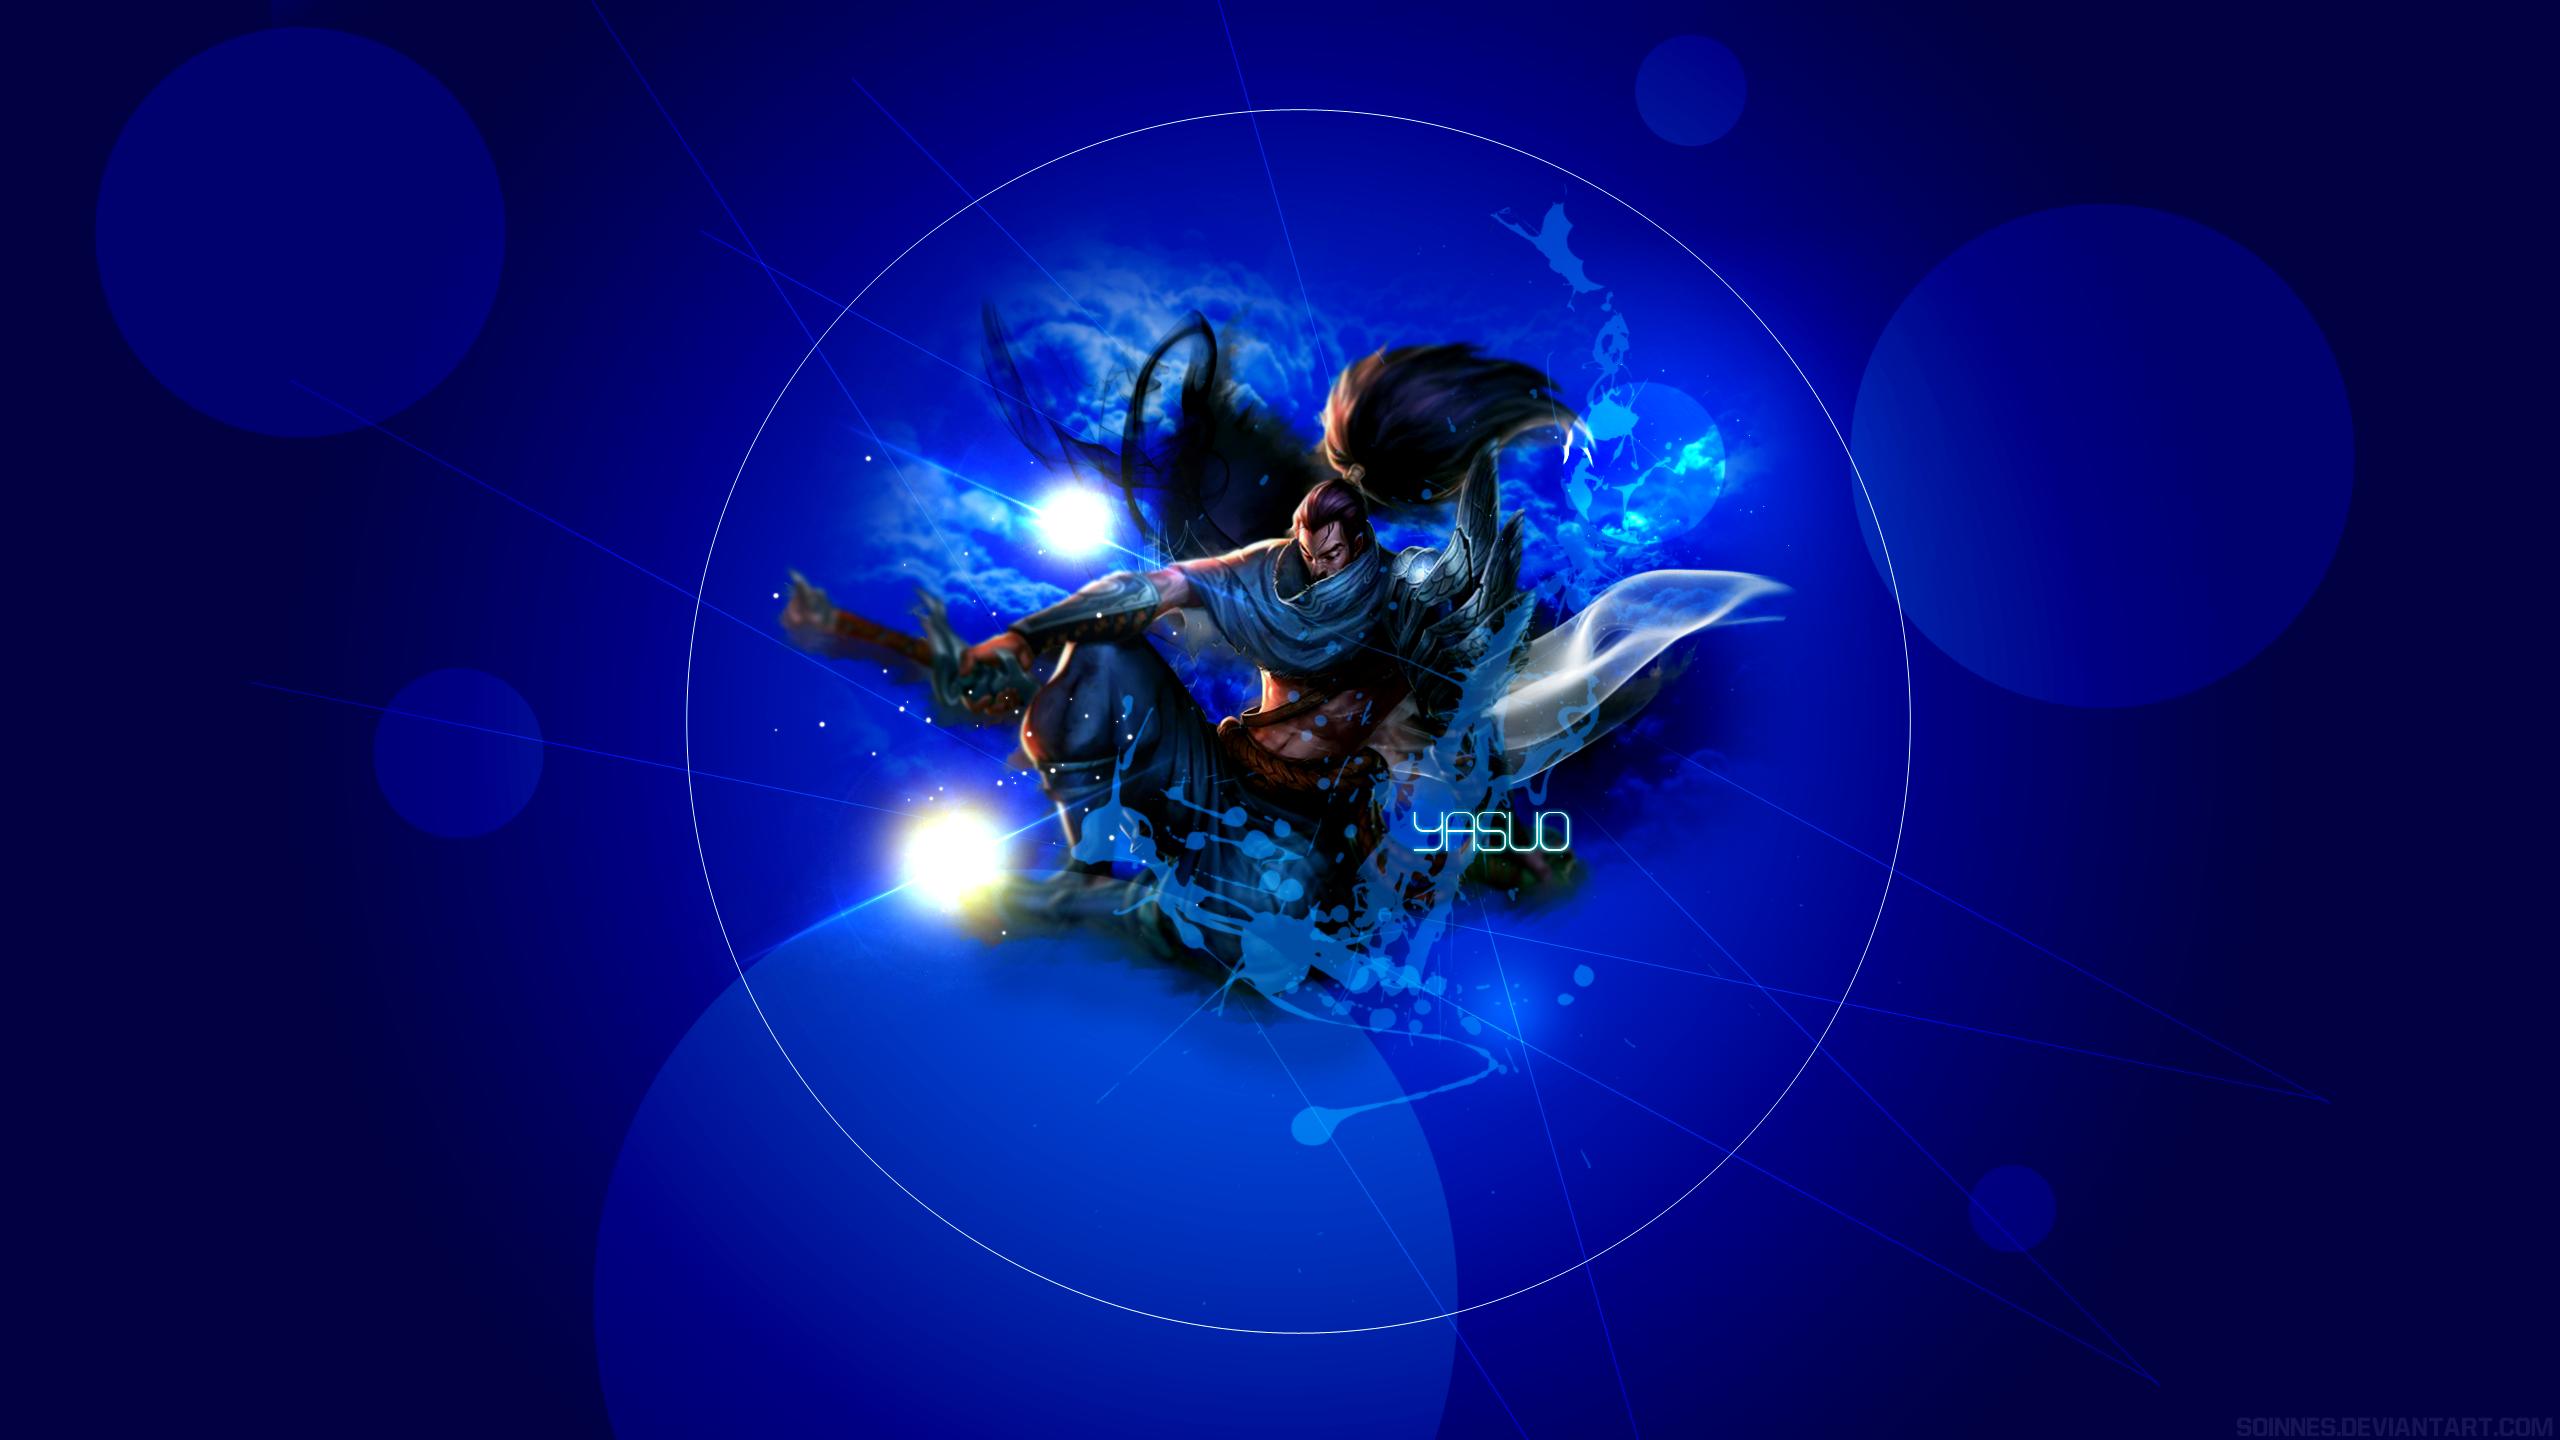 League Of Legends Yasuo Wallpaper: Yasuo Wallpaper By Soinnes On DeviantArt